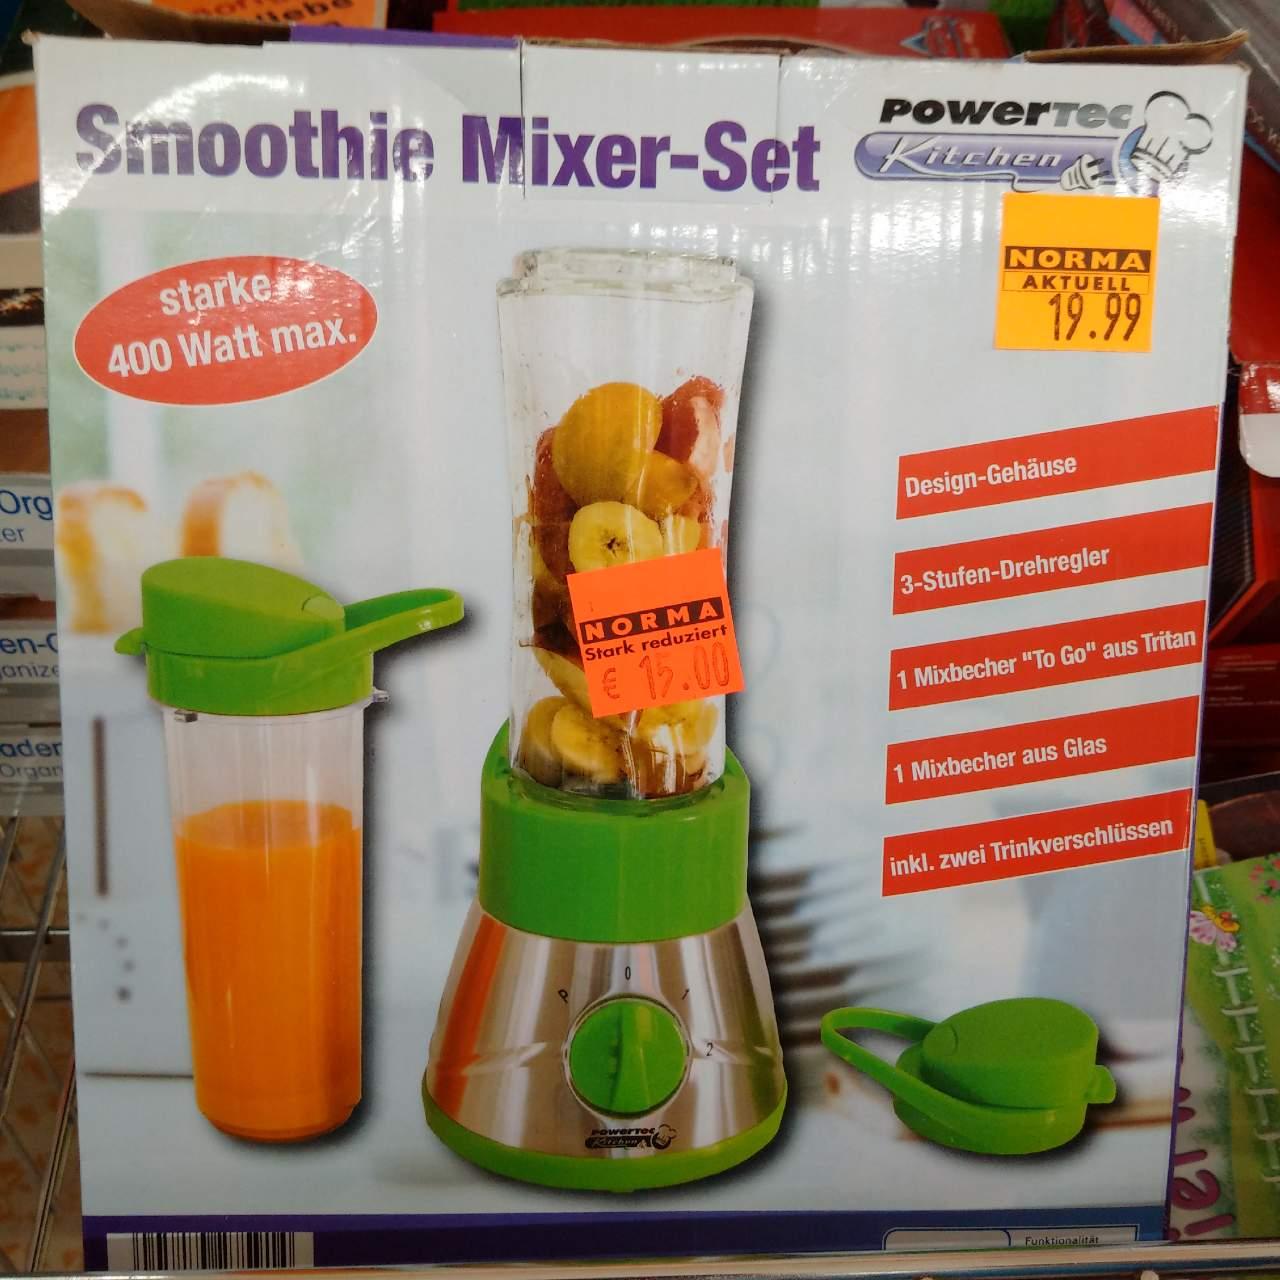 Powertec Smoothie Mixer-Set 400 Watt